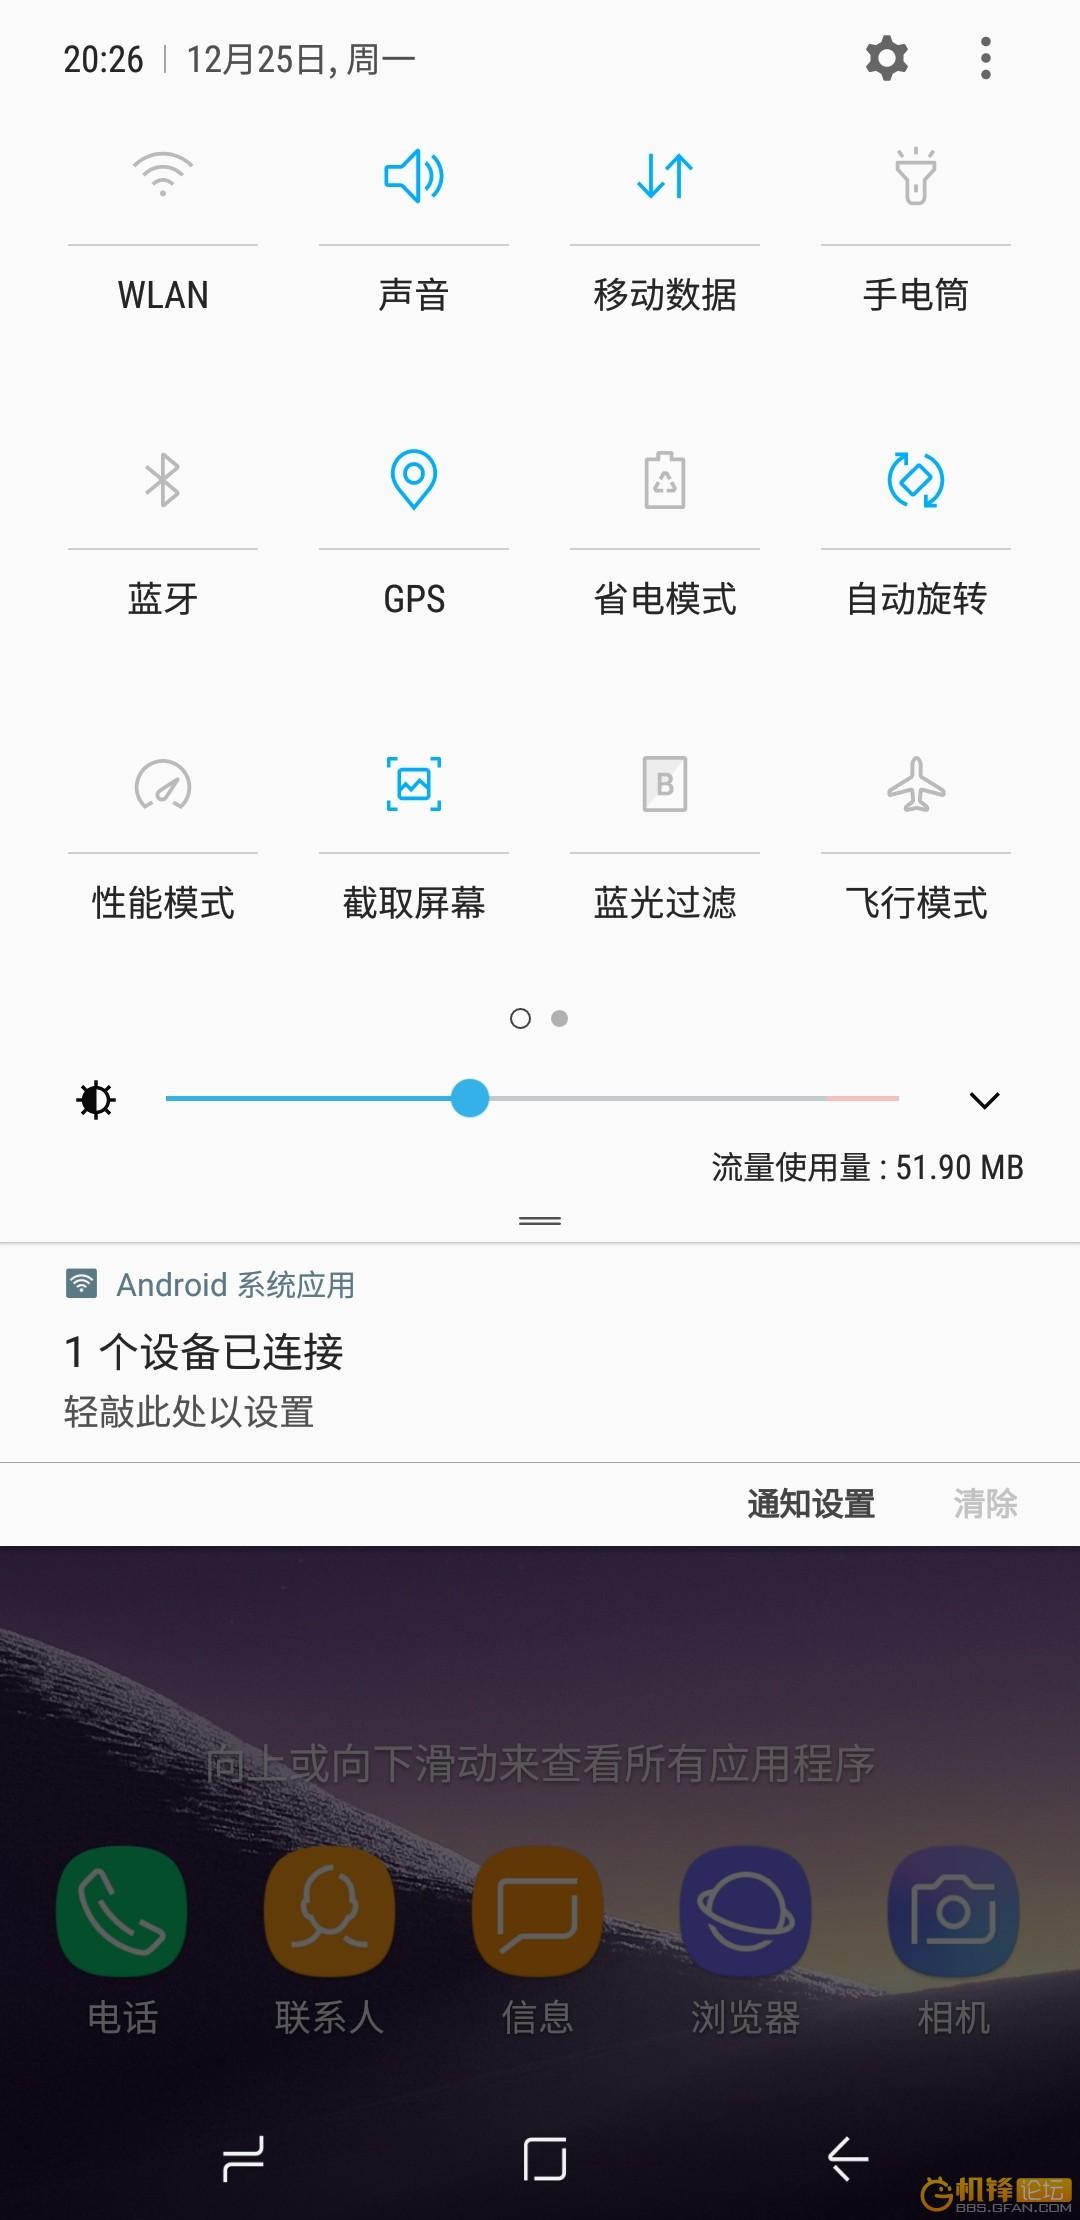 Screenshot_Samsung Experience Home_20171225-20264.jpg